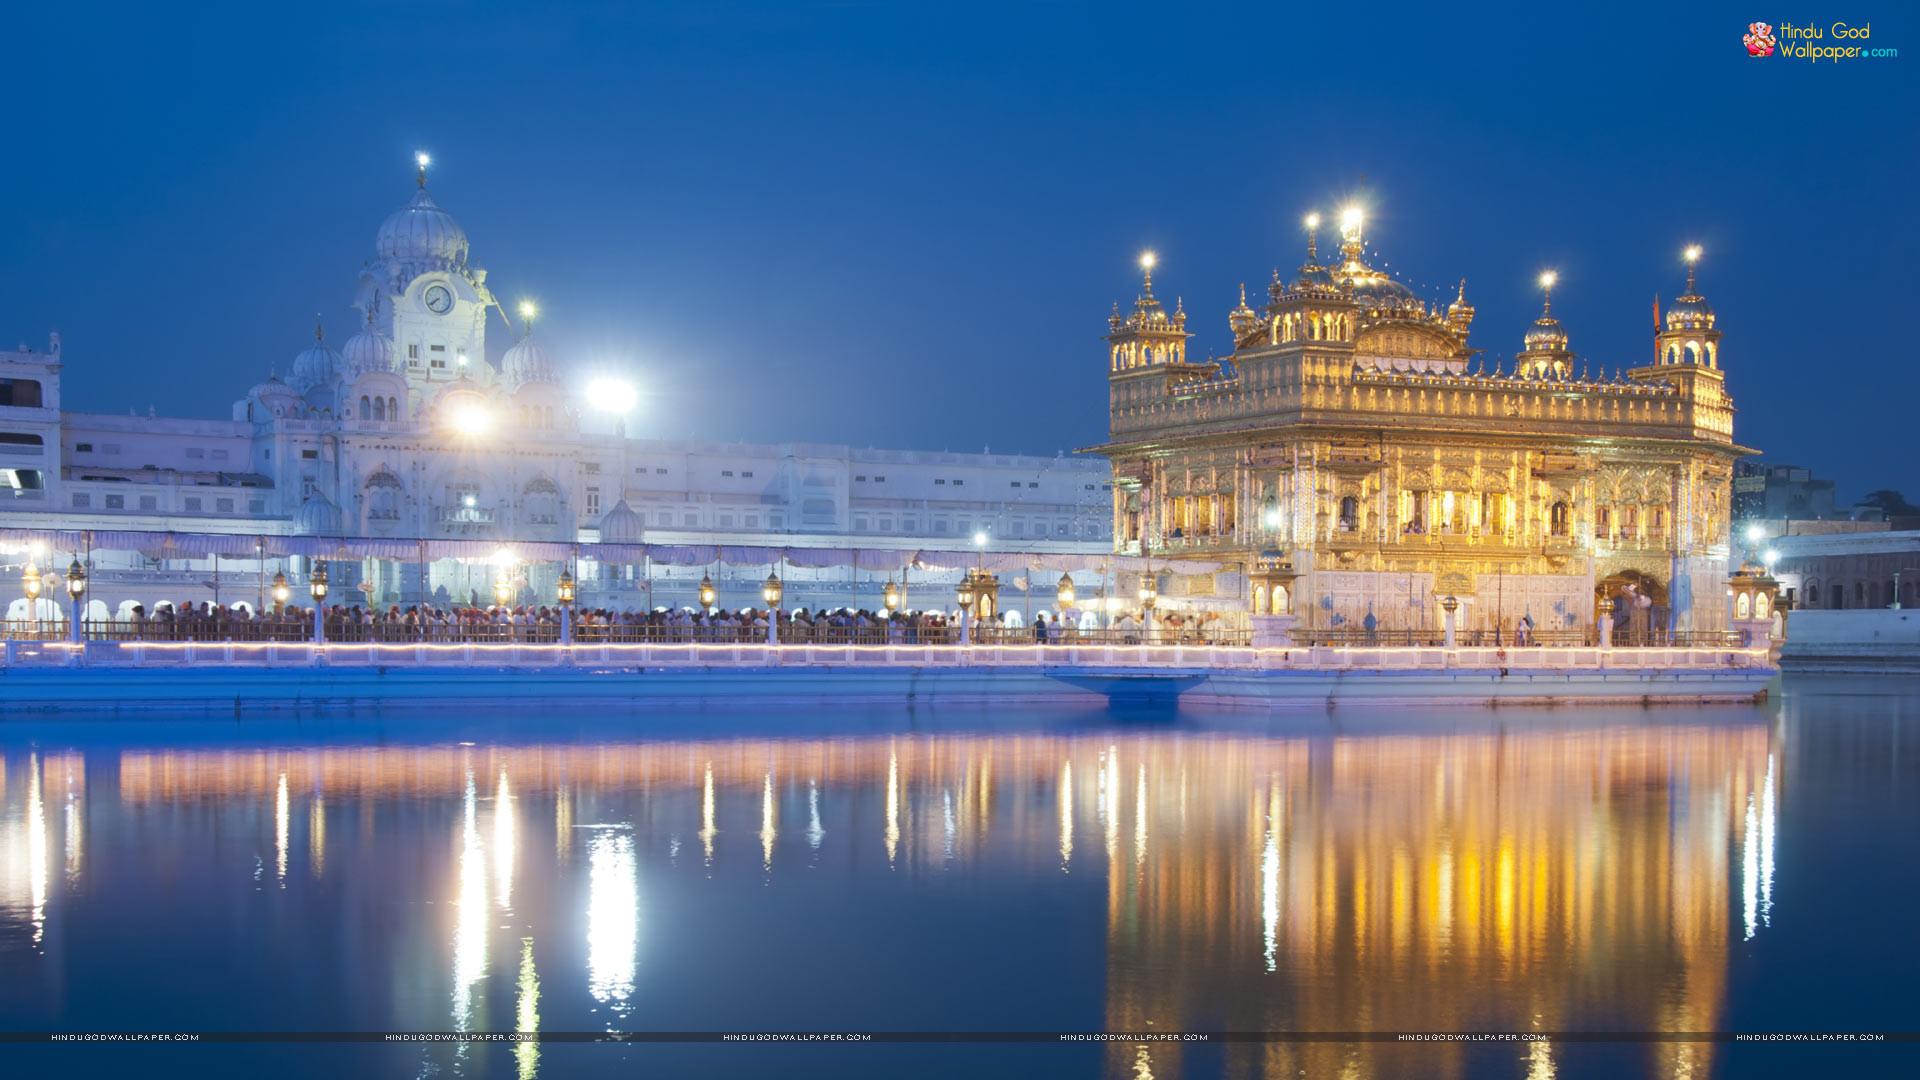 Sikh Backgrounds 41 Images